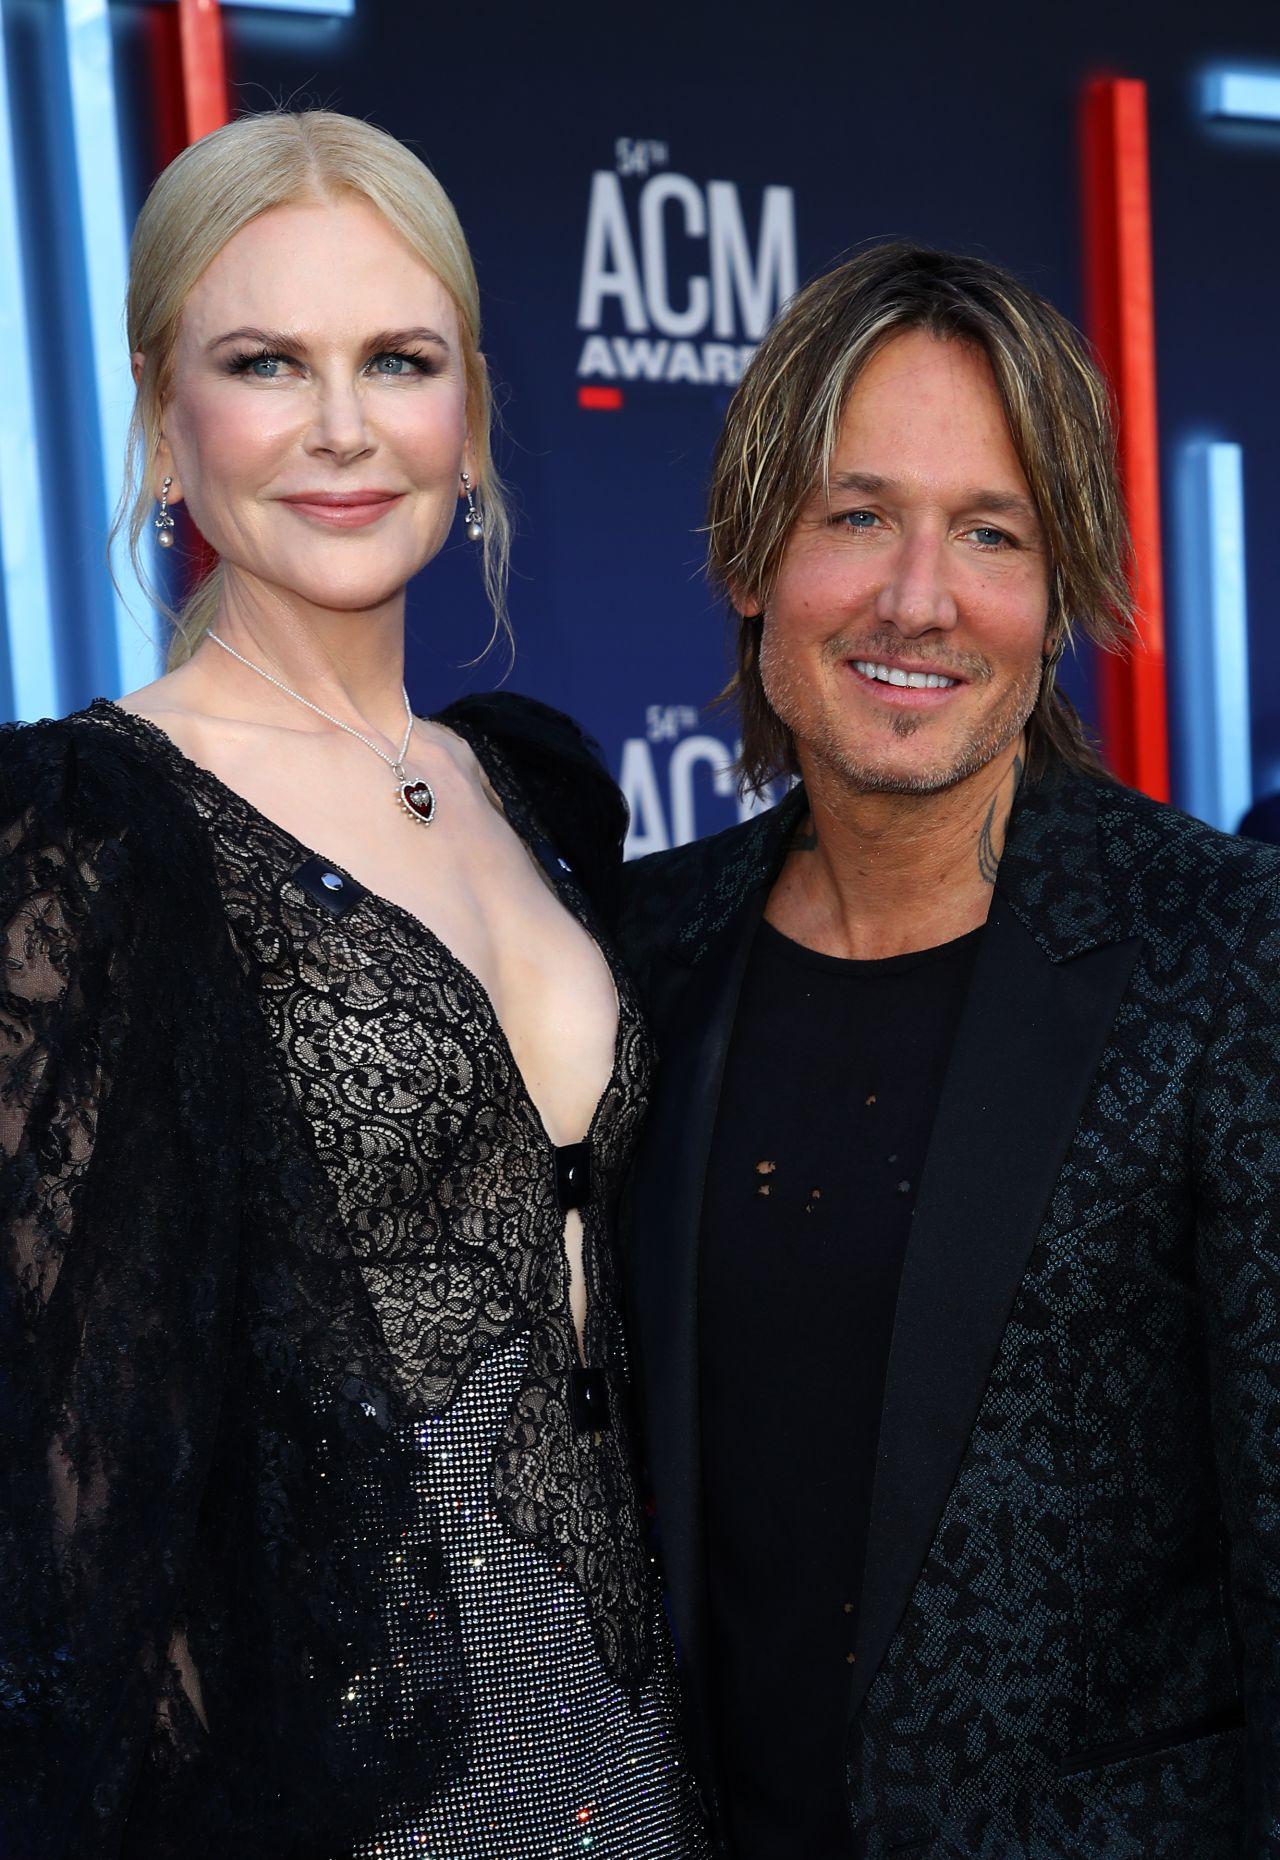 Nicole Kidman 2019 Acm Awards